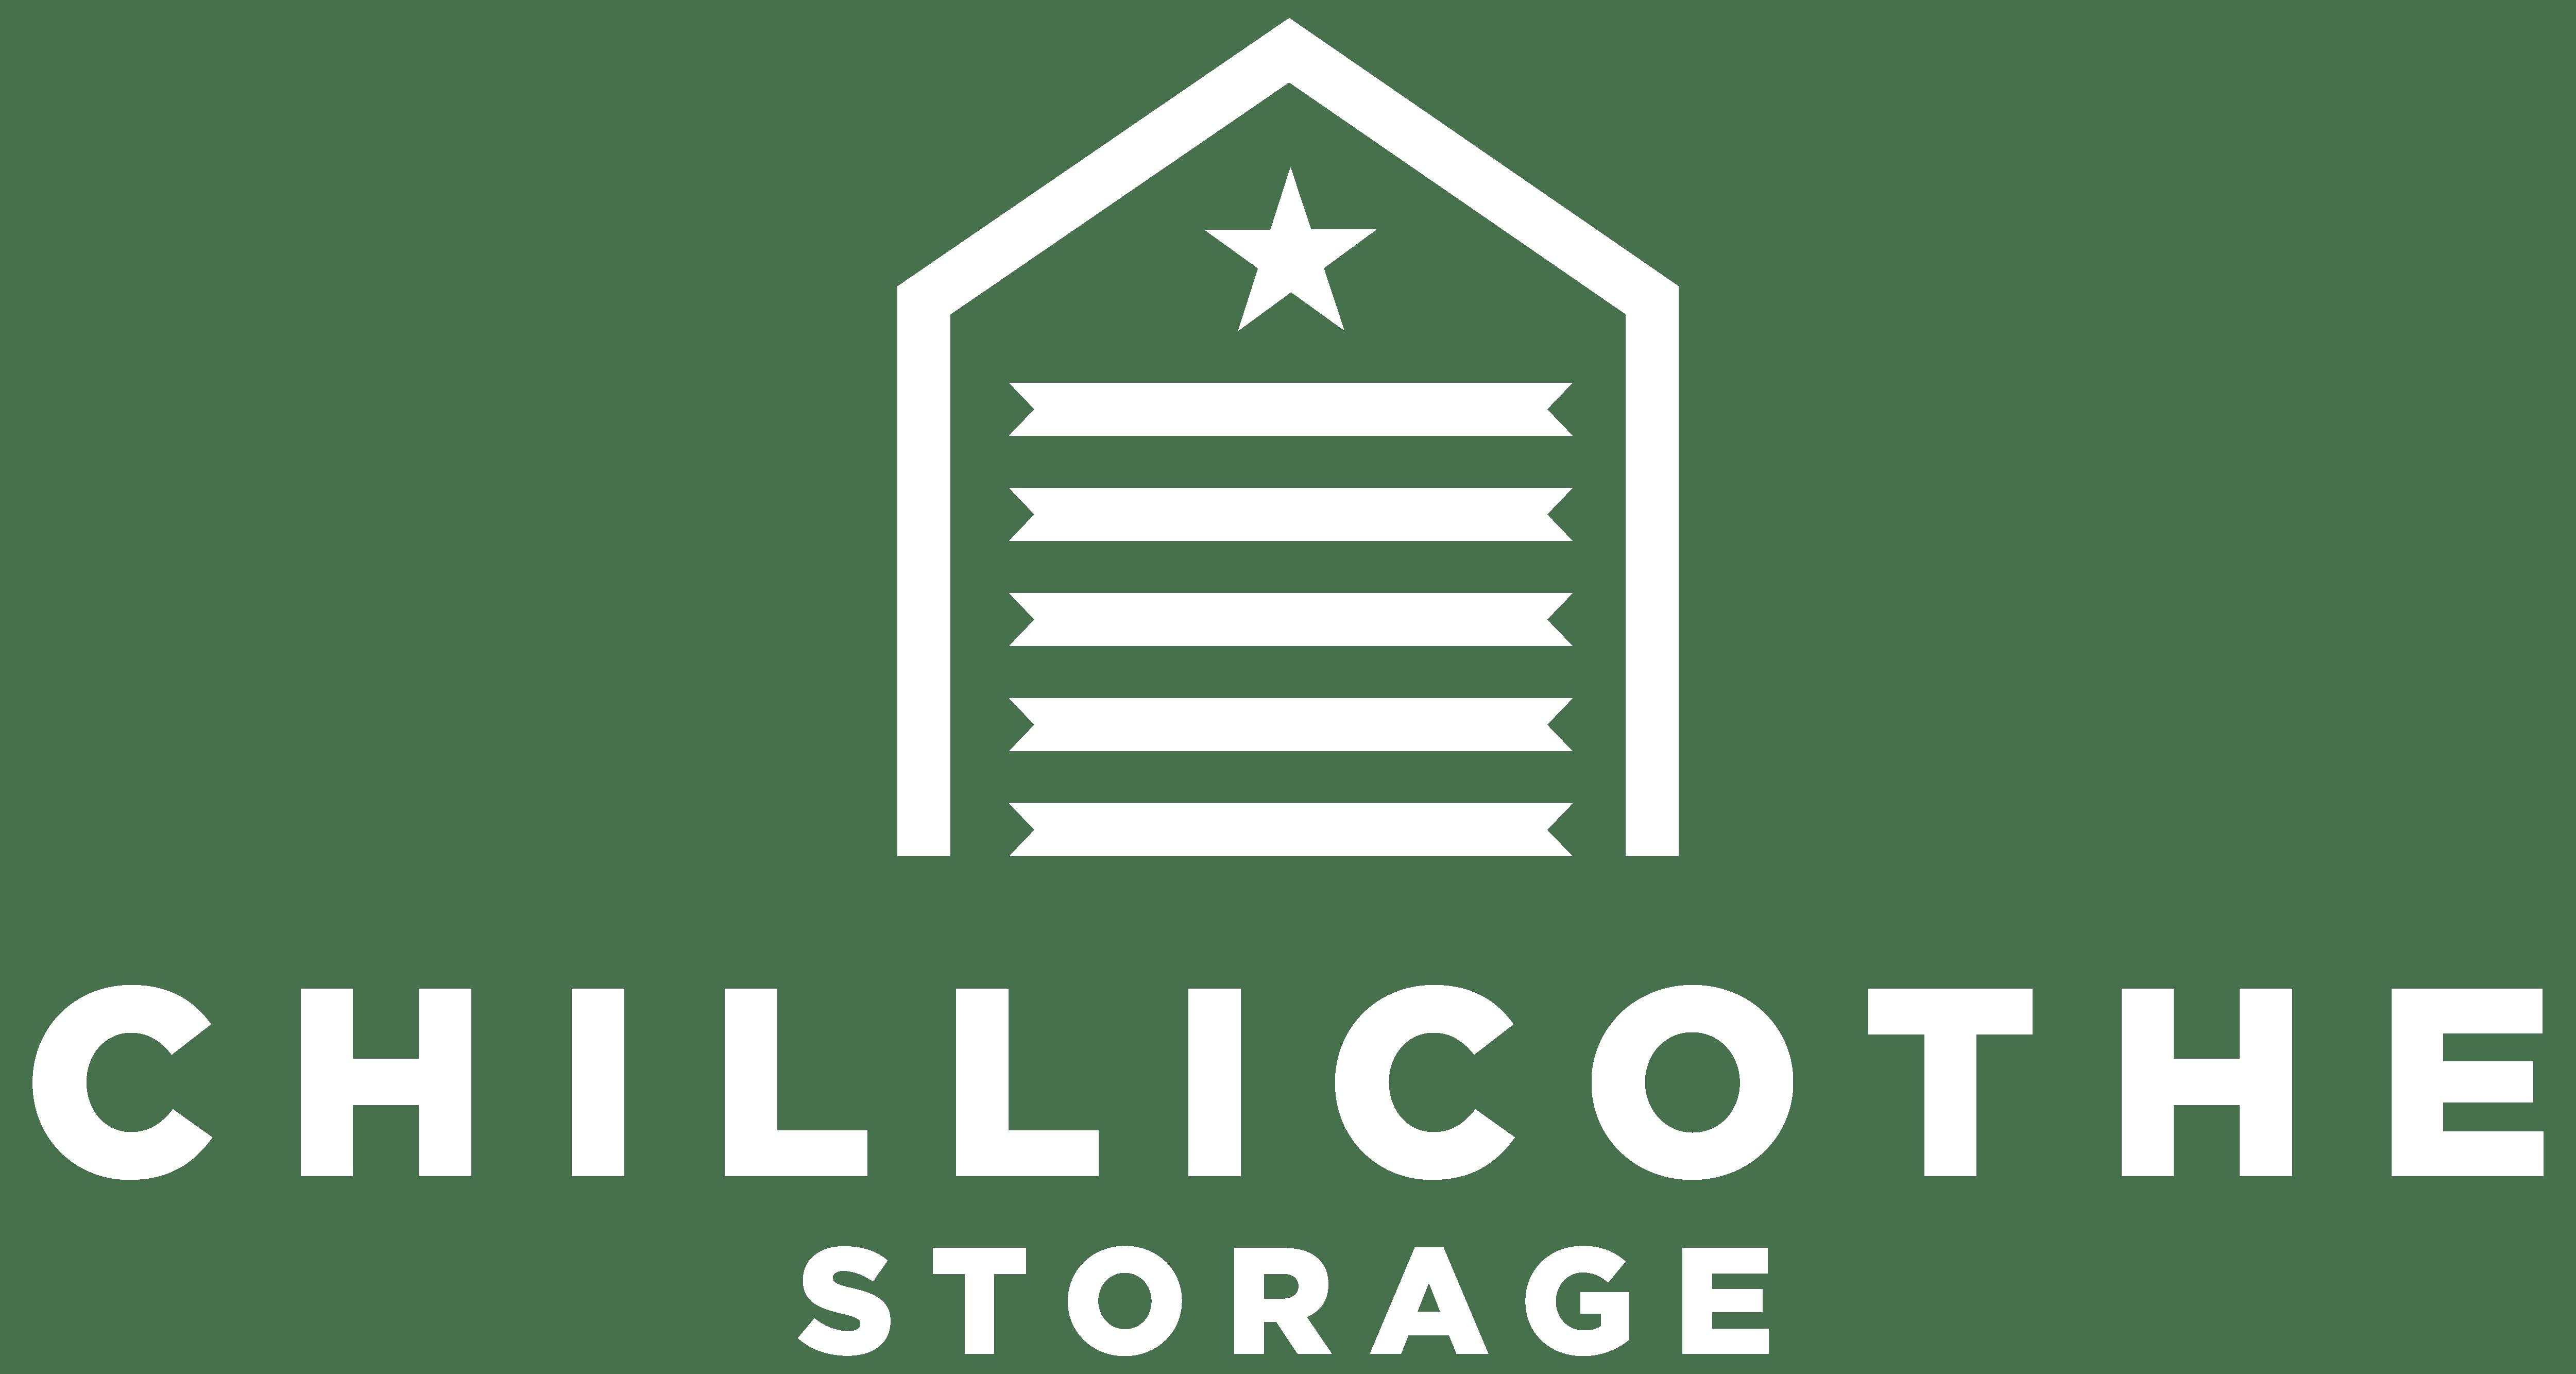 Chillicothe Storage